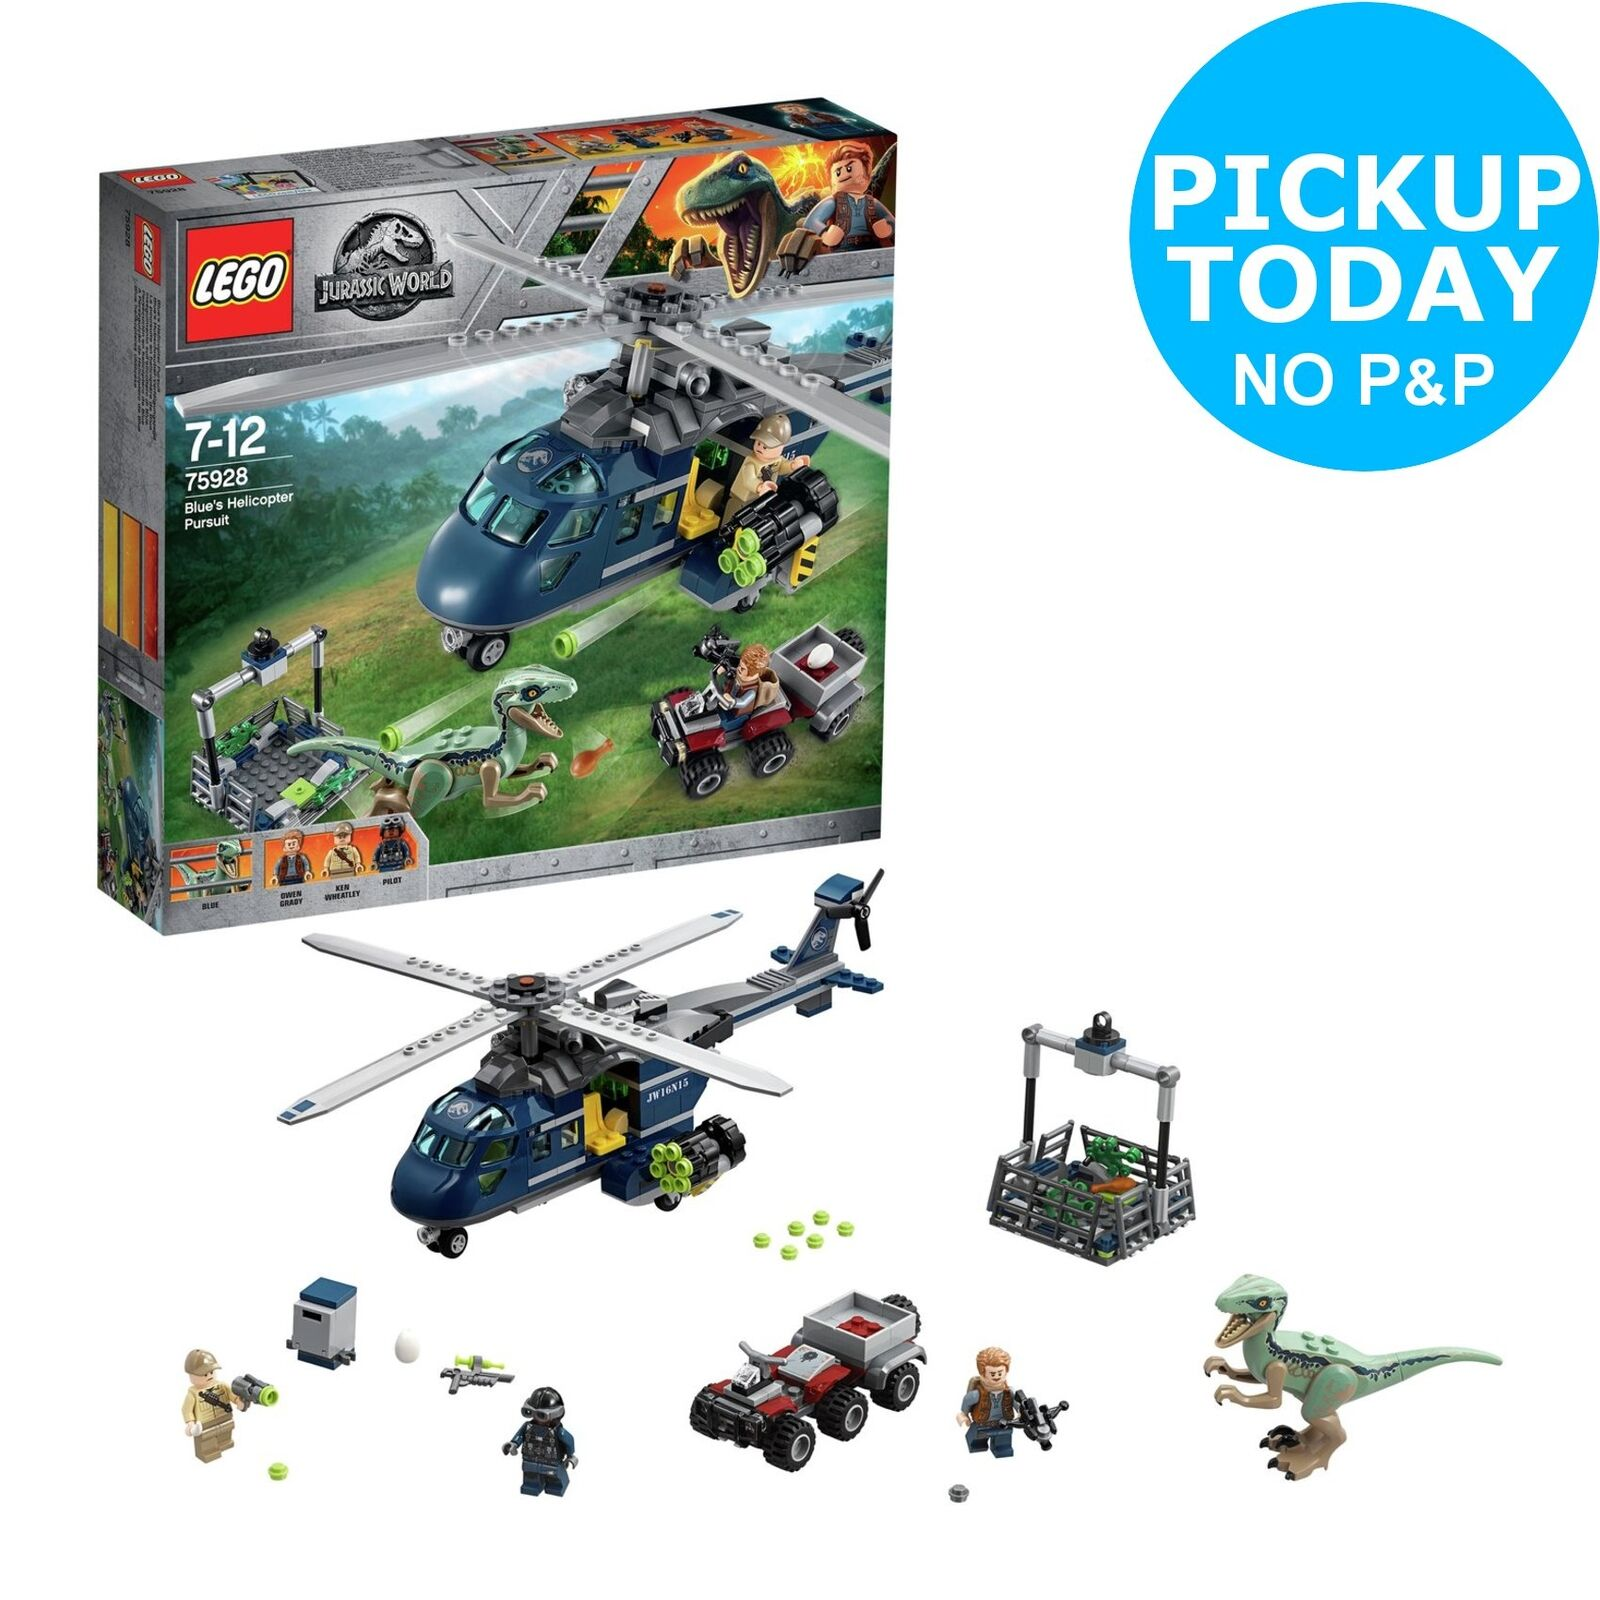 LEGO Jurassic World bluee's Helicopter Set - 75928.